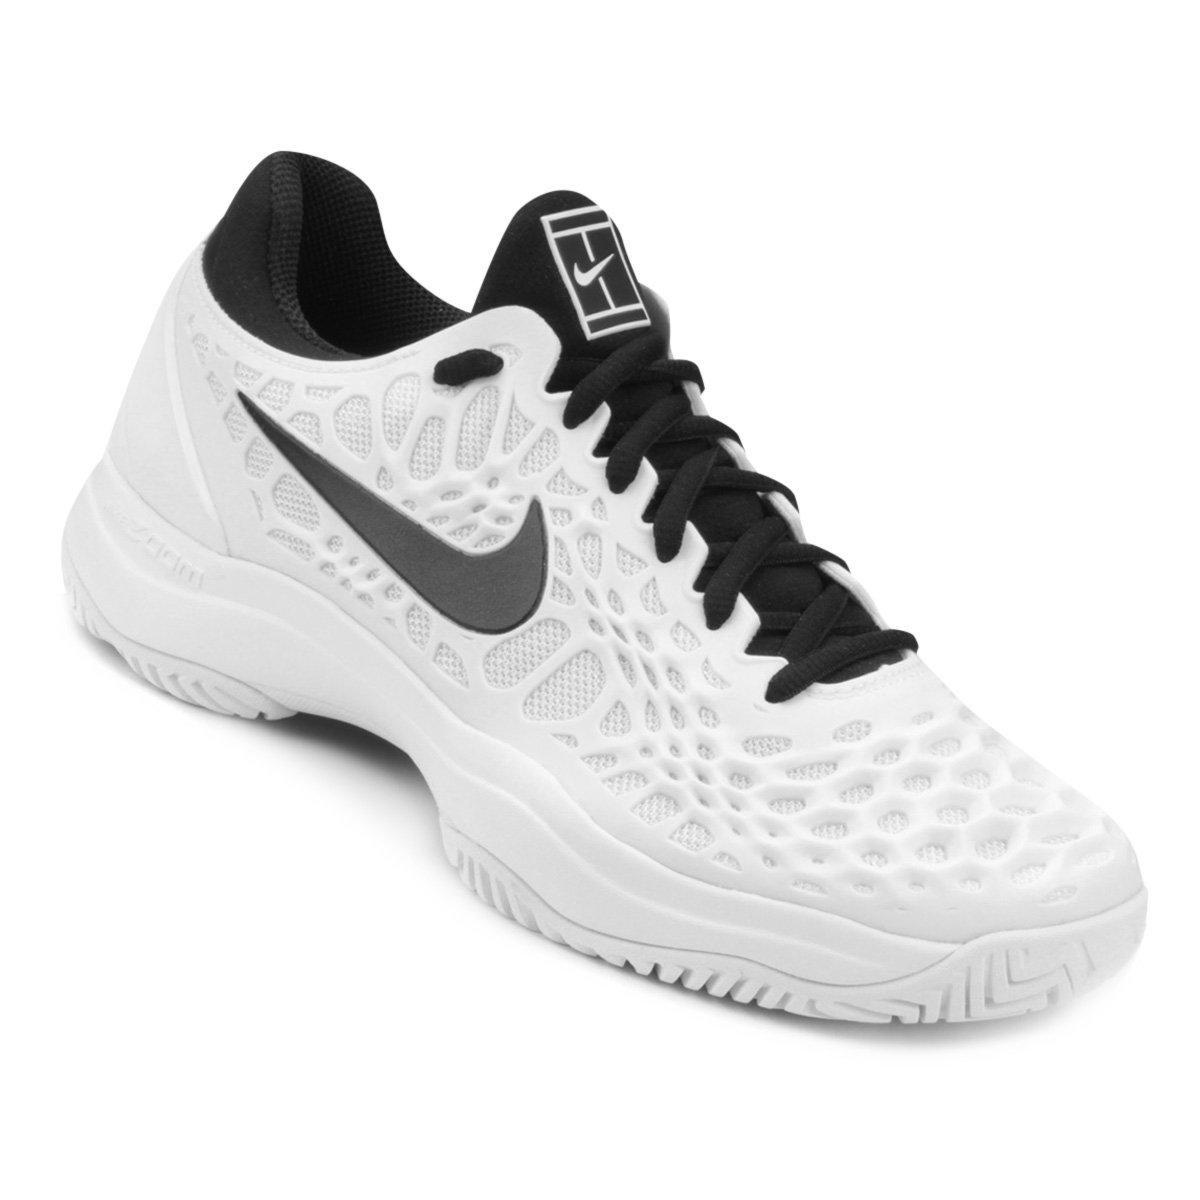 62e31d295a1 Tênis Nike Air Zoom Cage 3HC Masculino - Compre Agora